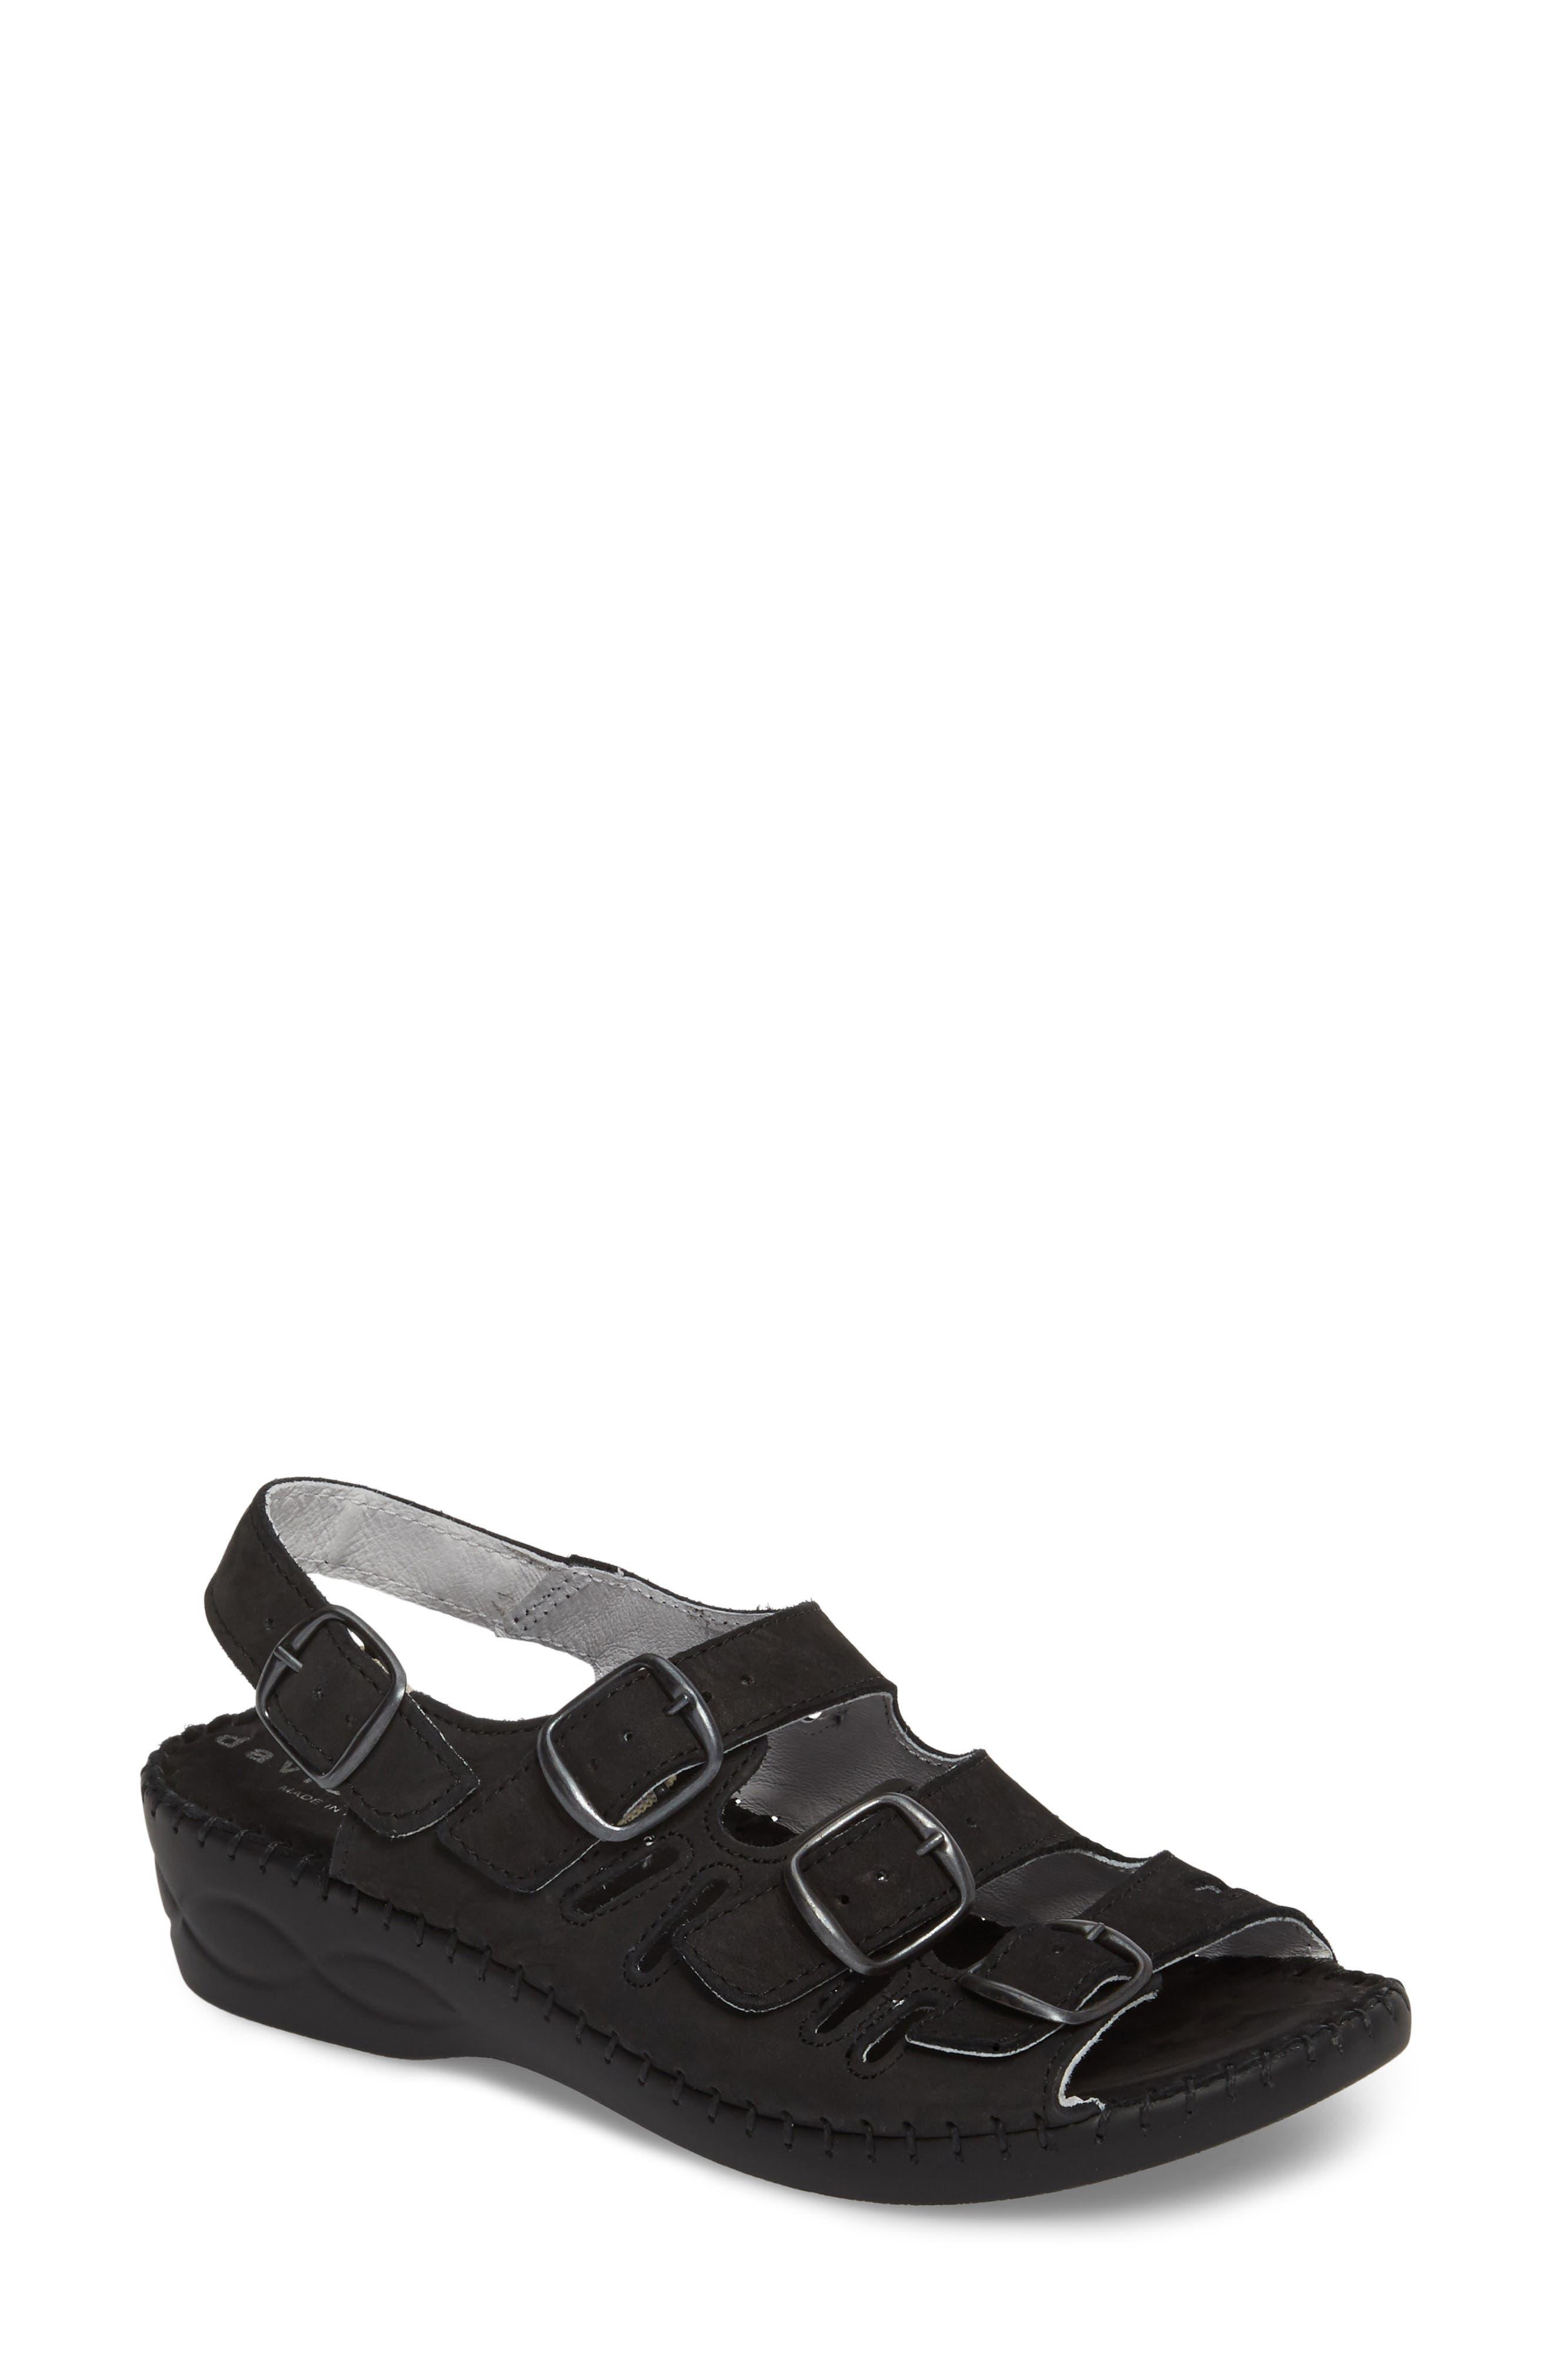 Luna Slingback Wedge Sandal,                         Main,                         color, BLACK NUBUCK